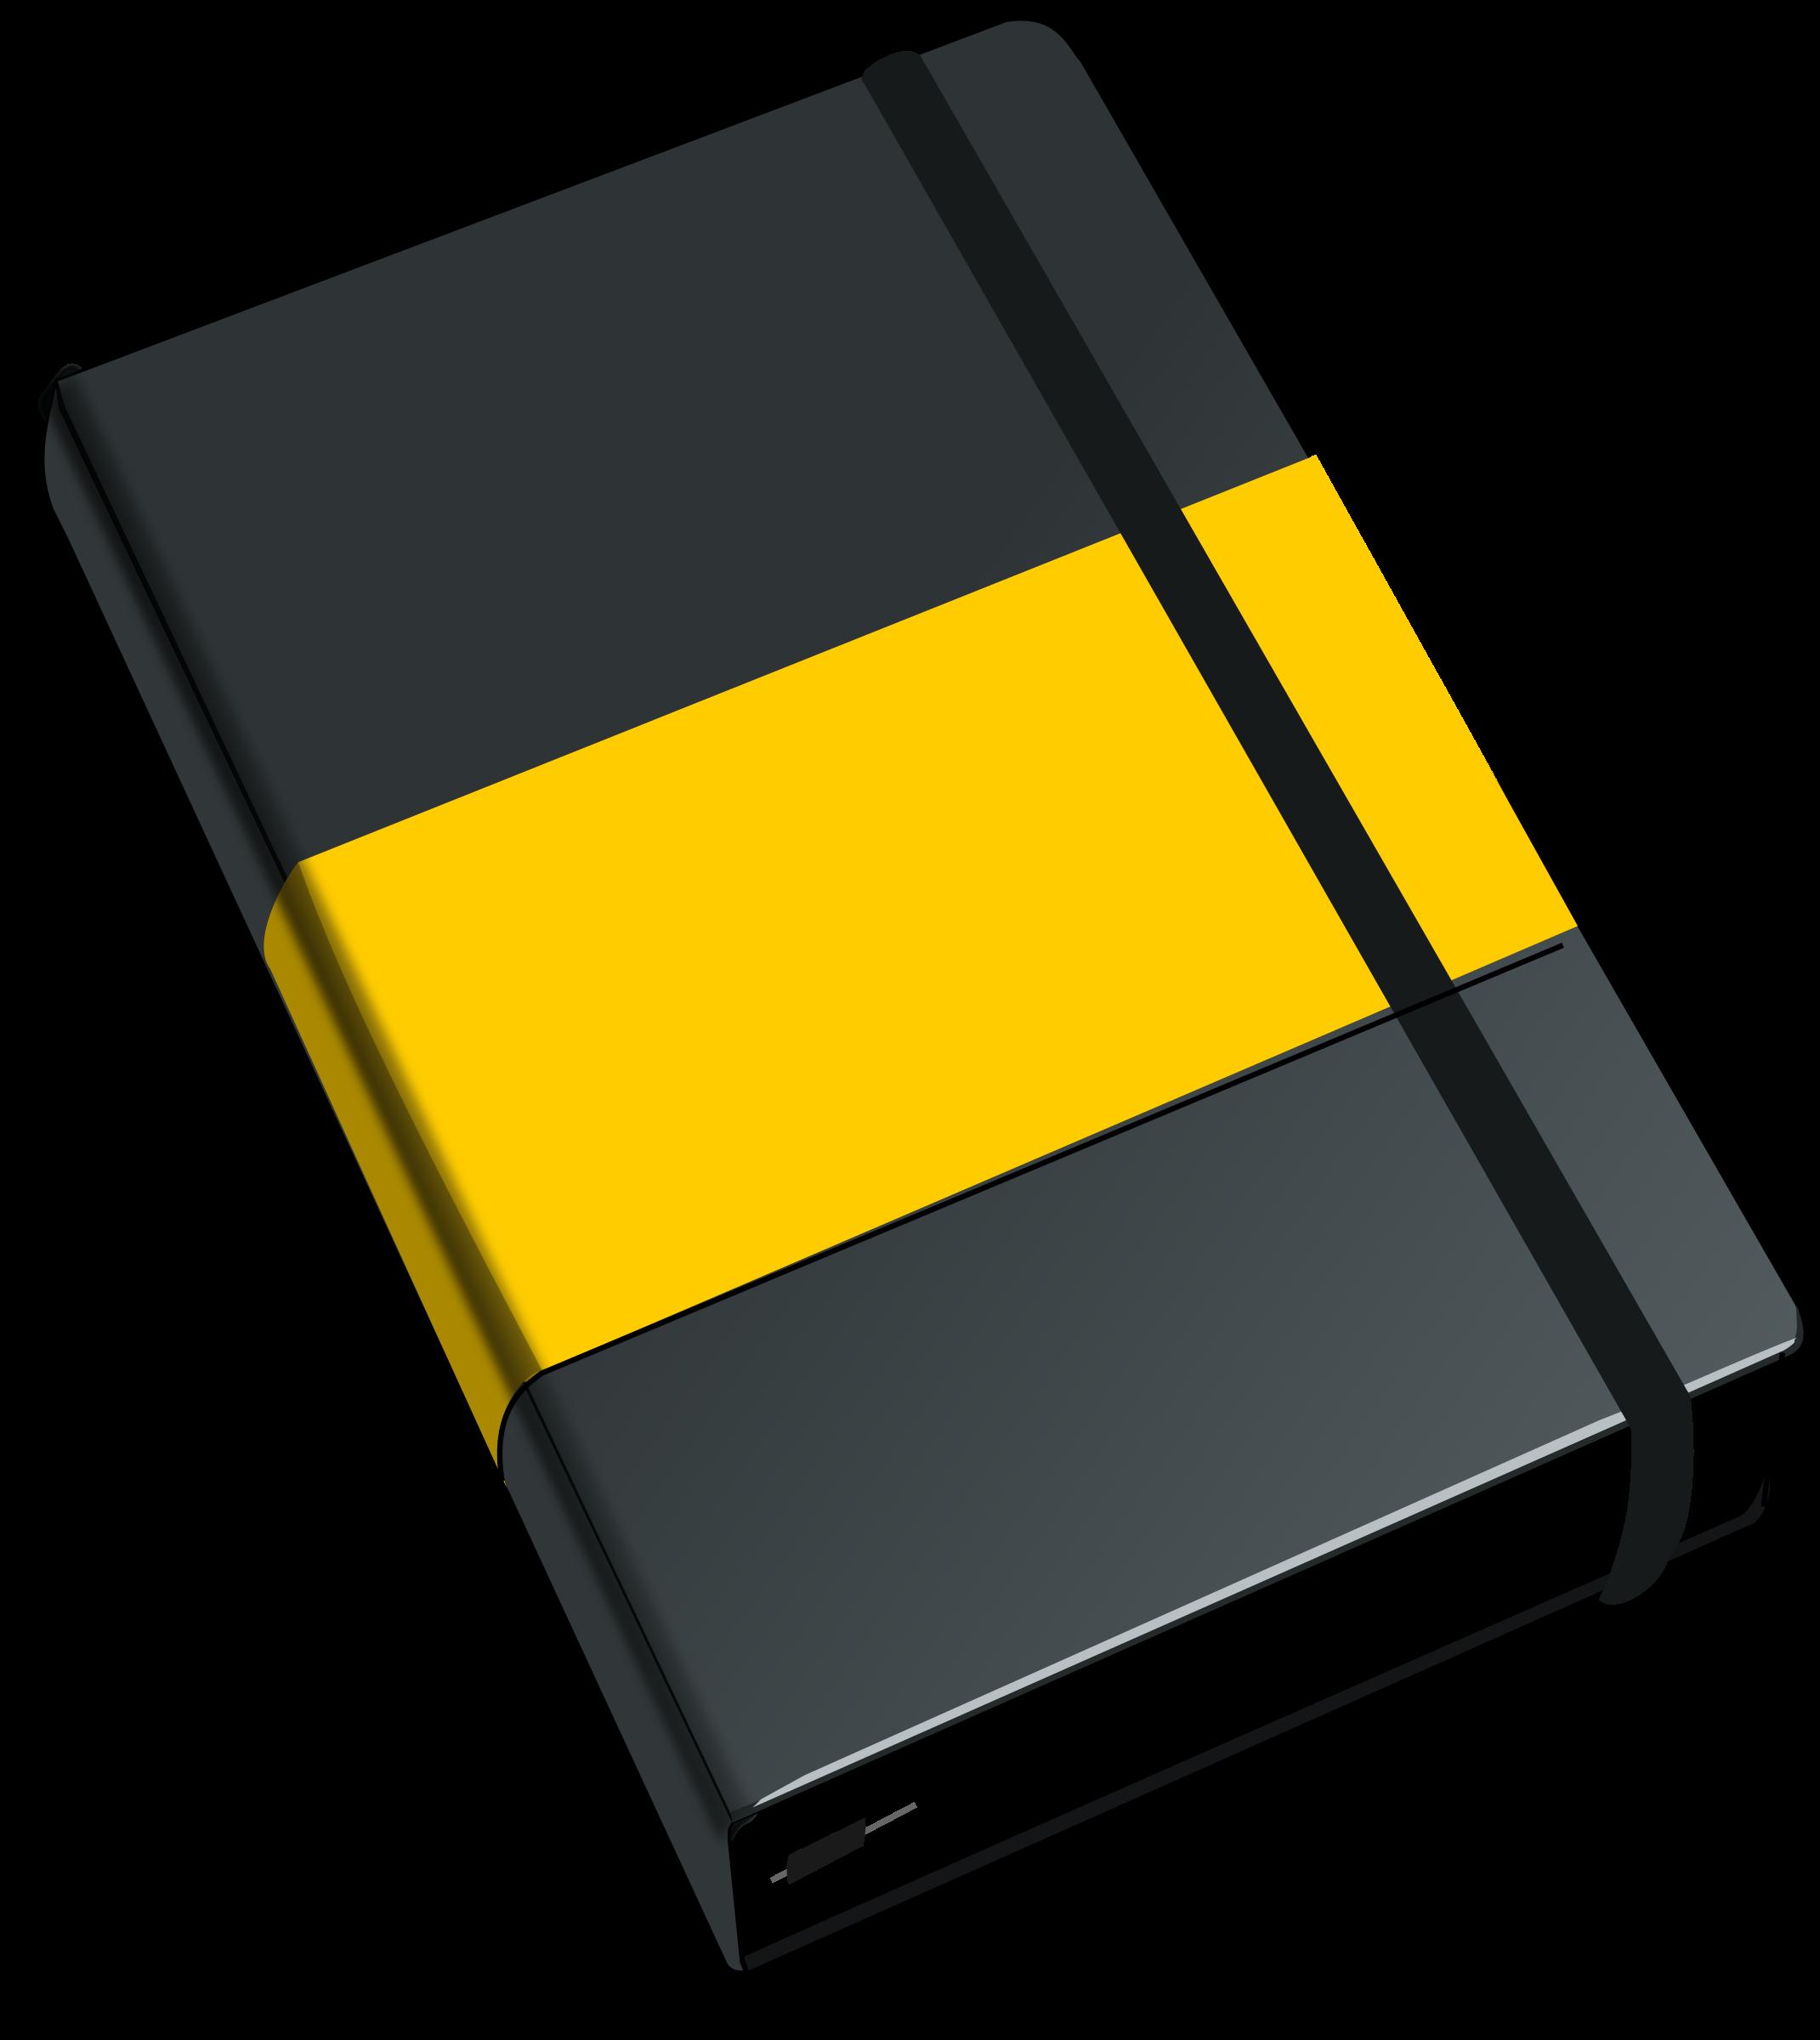 Agenda book clipart clipart free stock Clipart - Moleskine clipart free stock